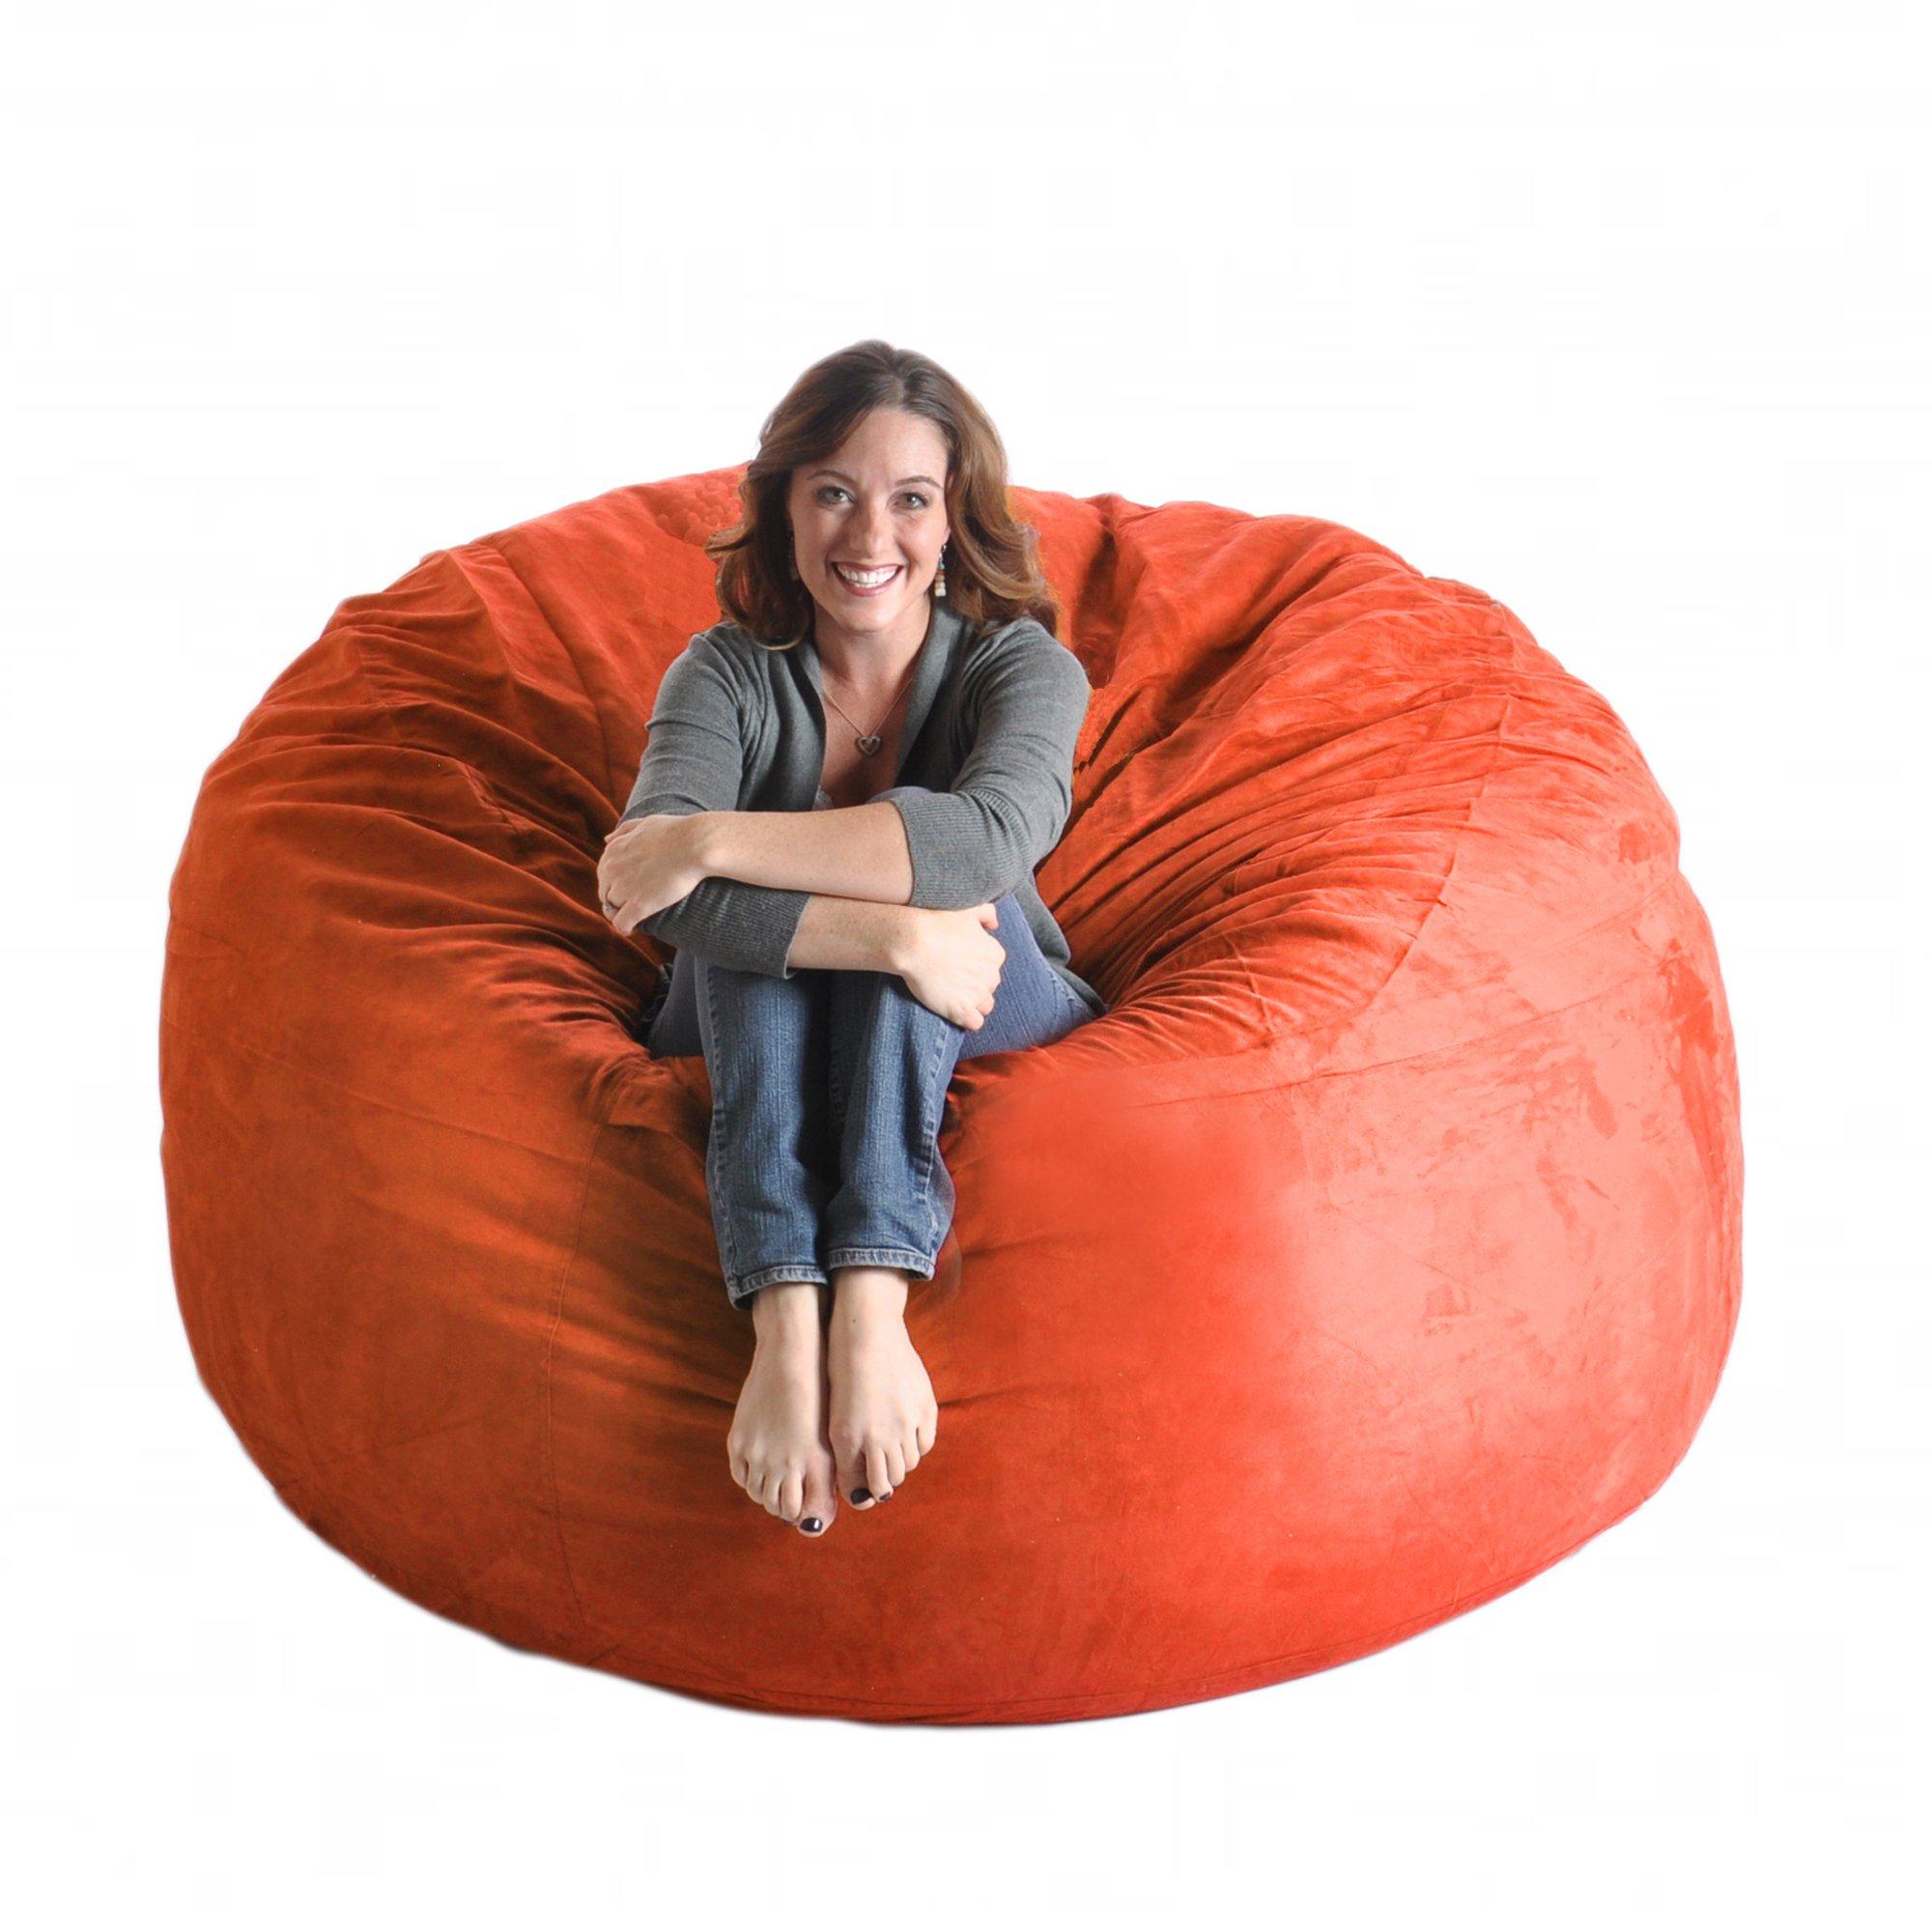 SLACKER sack 6-Feet Premium Memory Foam Microsuede Beanbag Chair, Orange